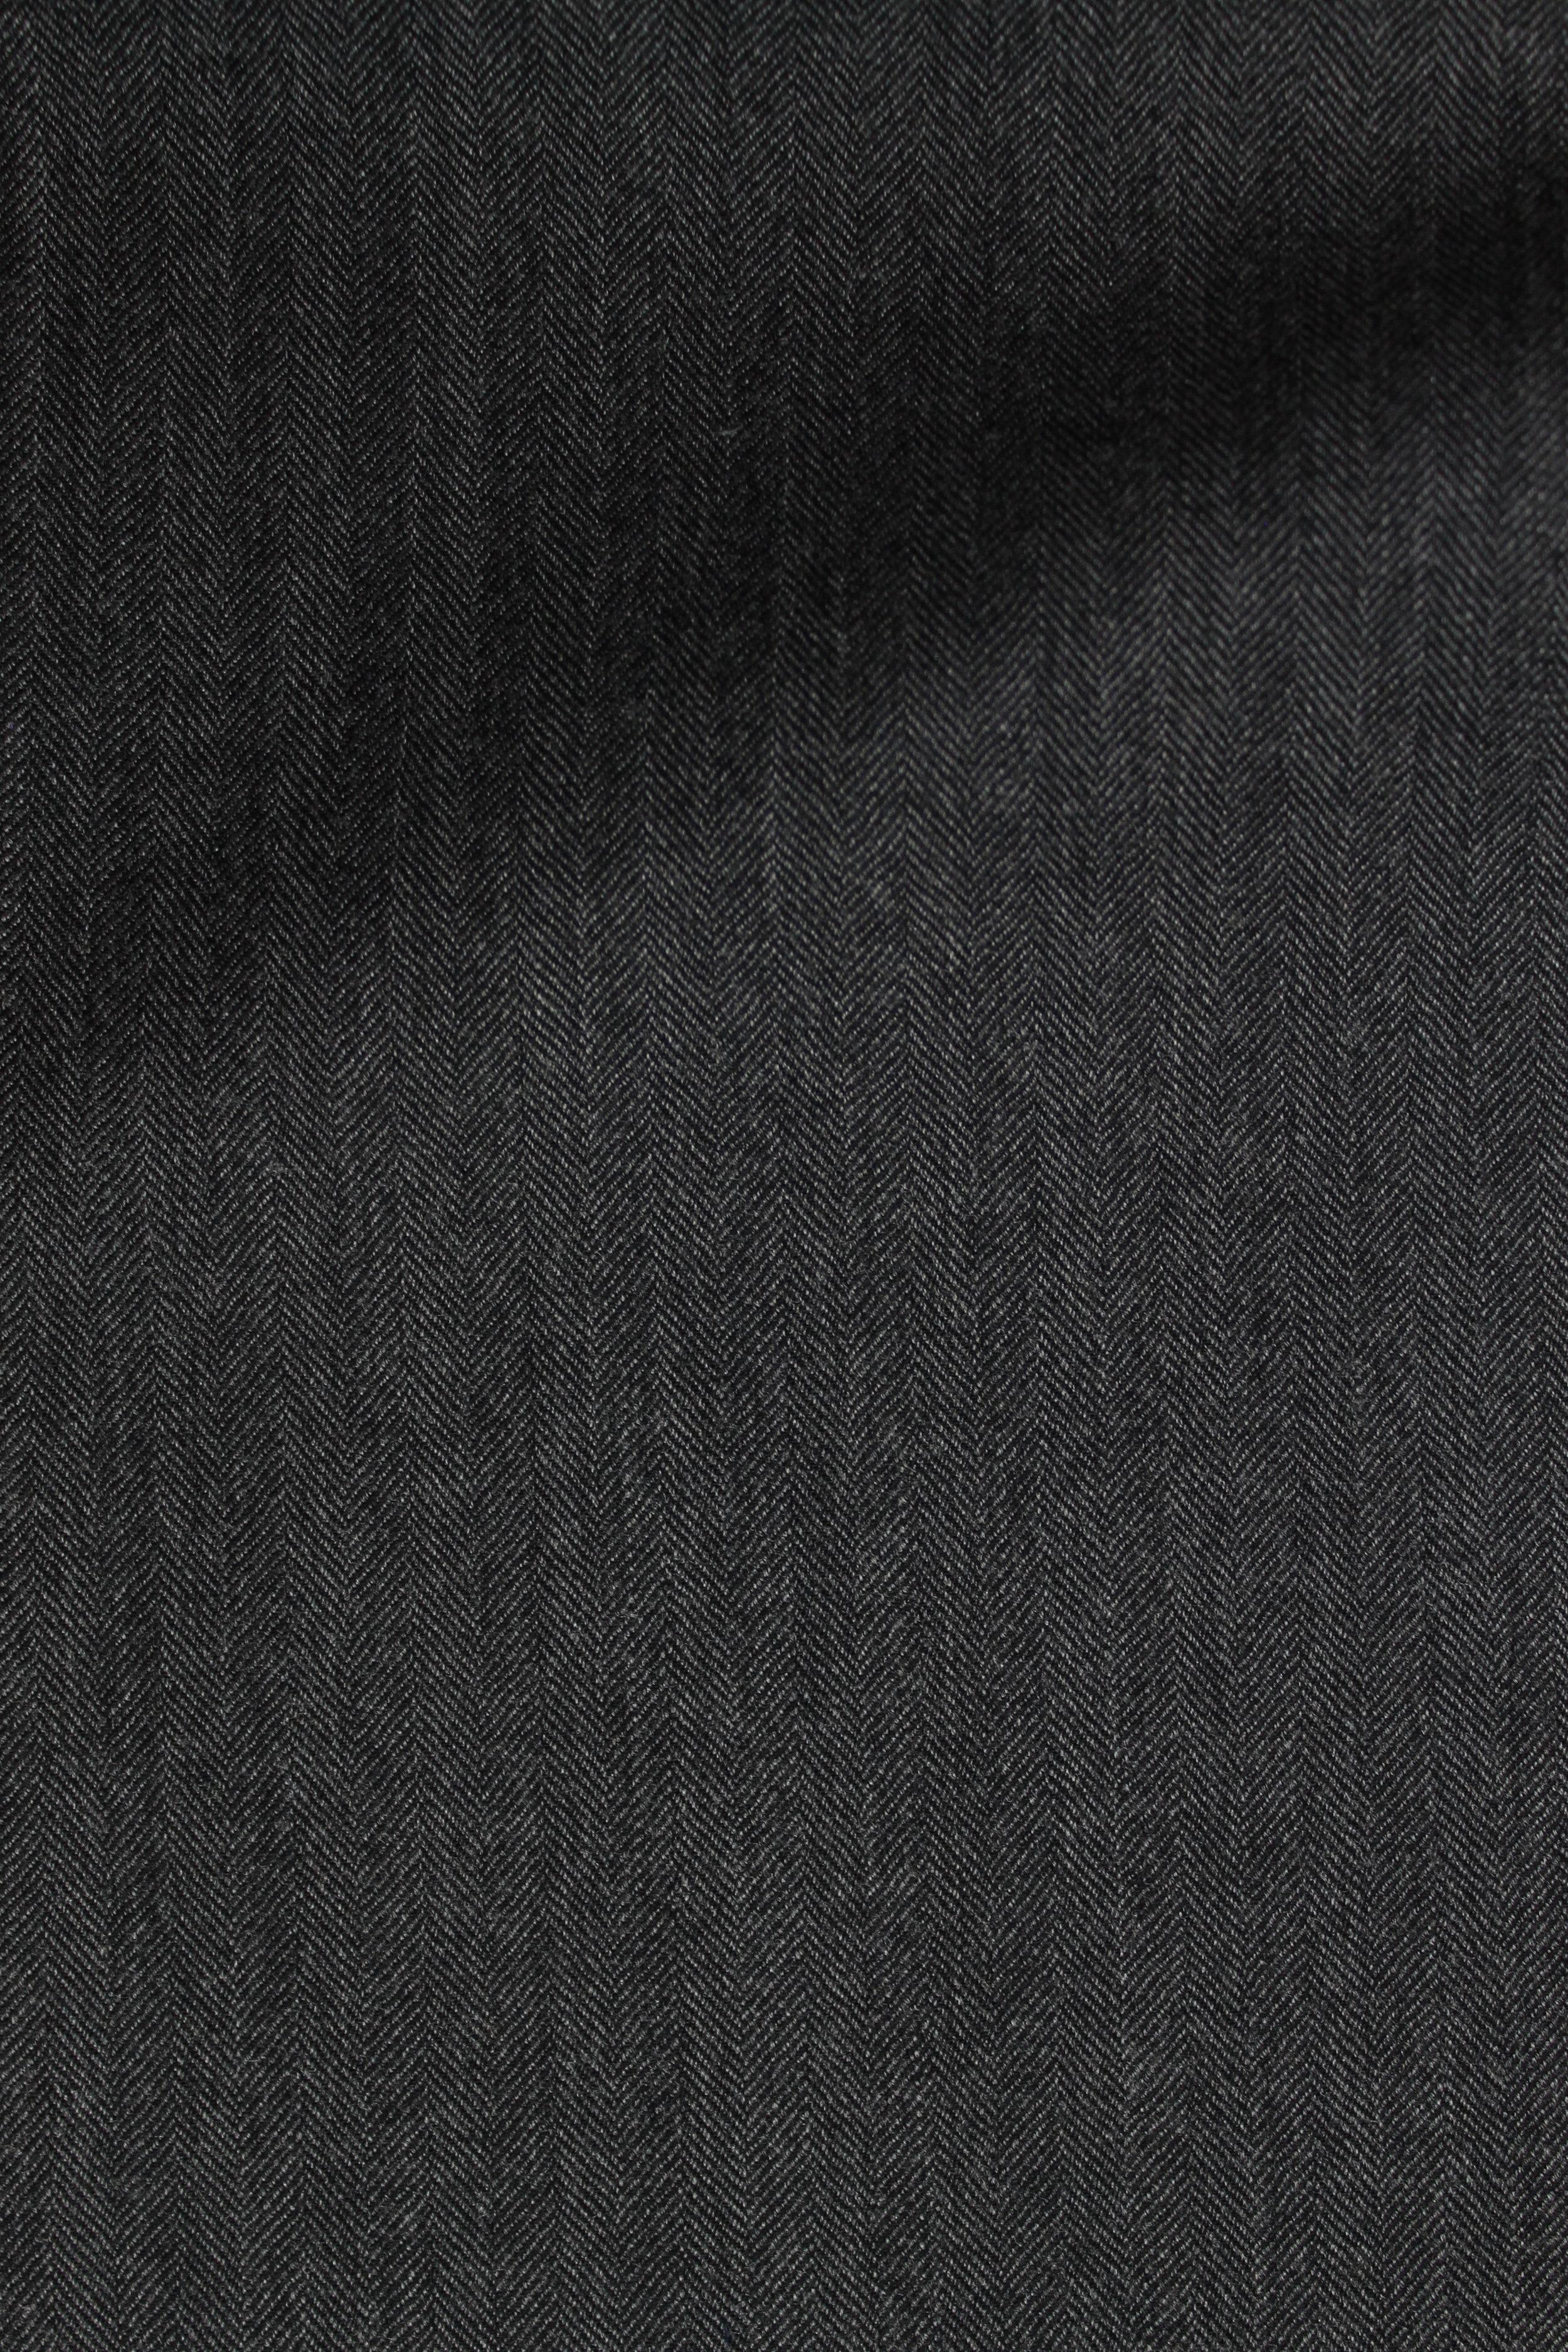 7540 Grey Herringbone 290g.JPG